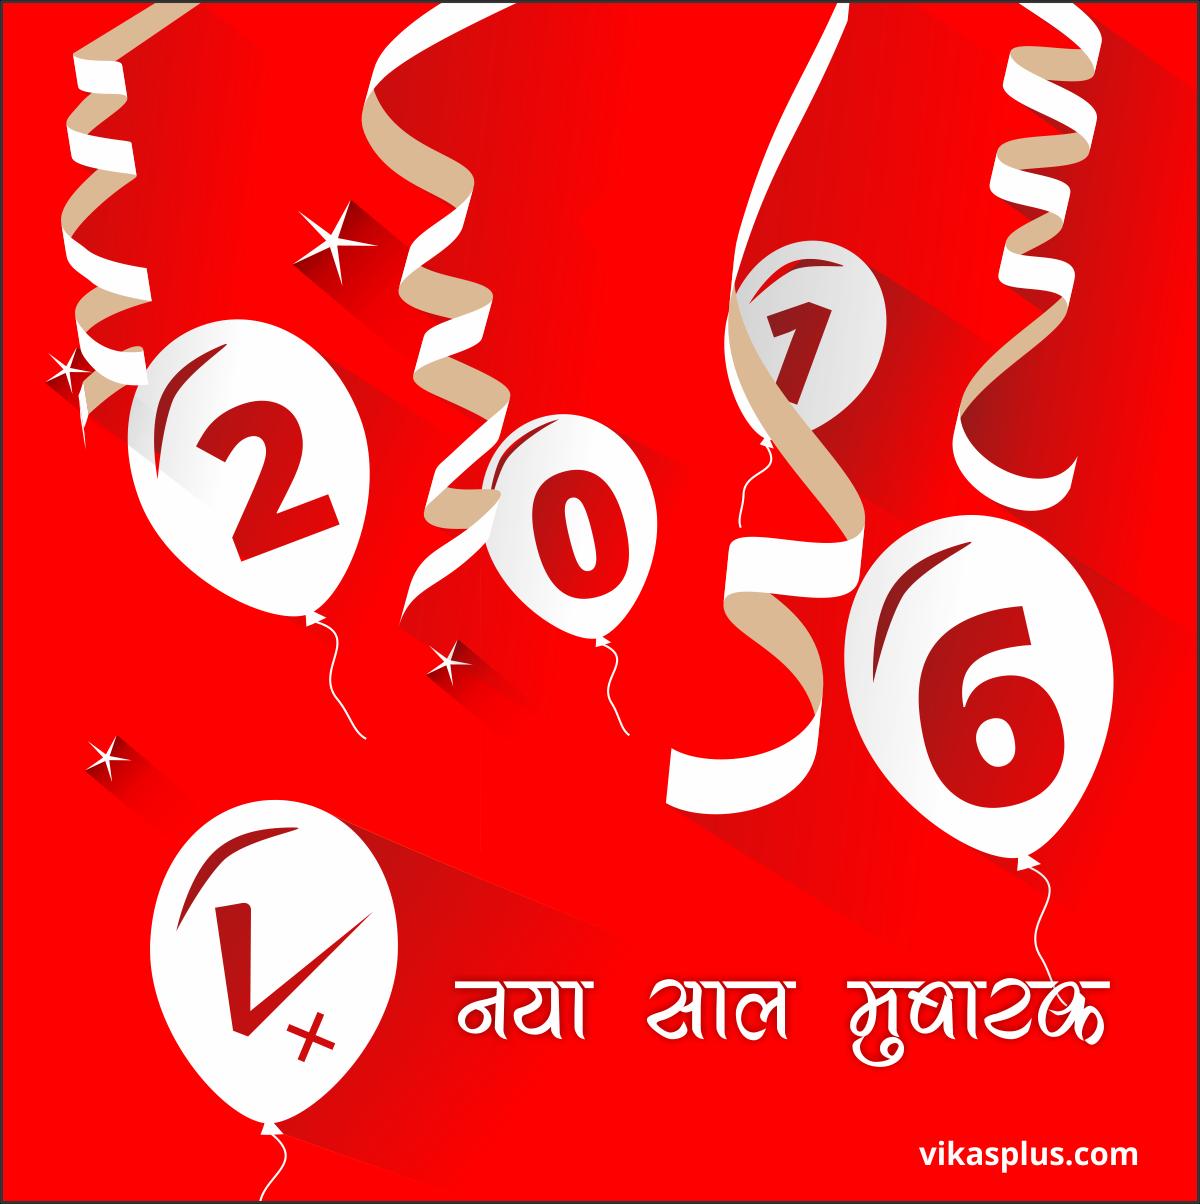 vikasplus-happy-new-year-5